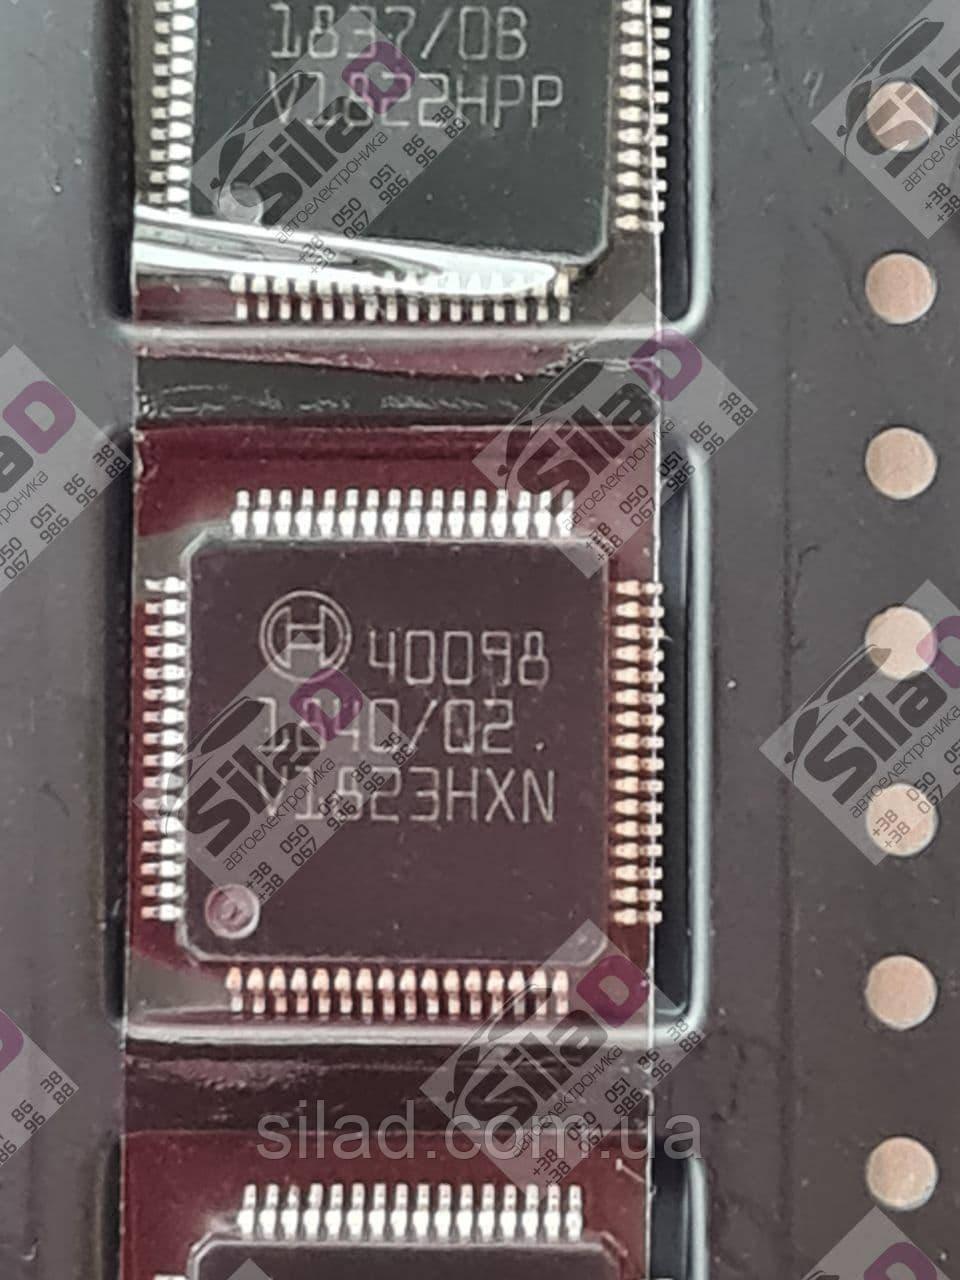 Микросхема Bosсh 40098 корпус QFP64